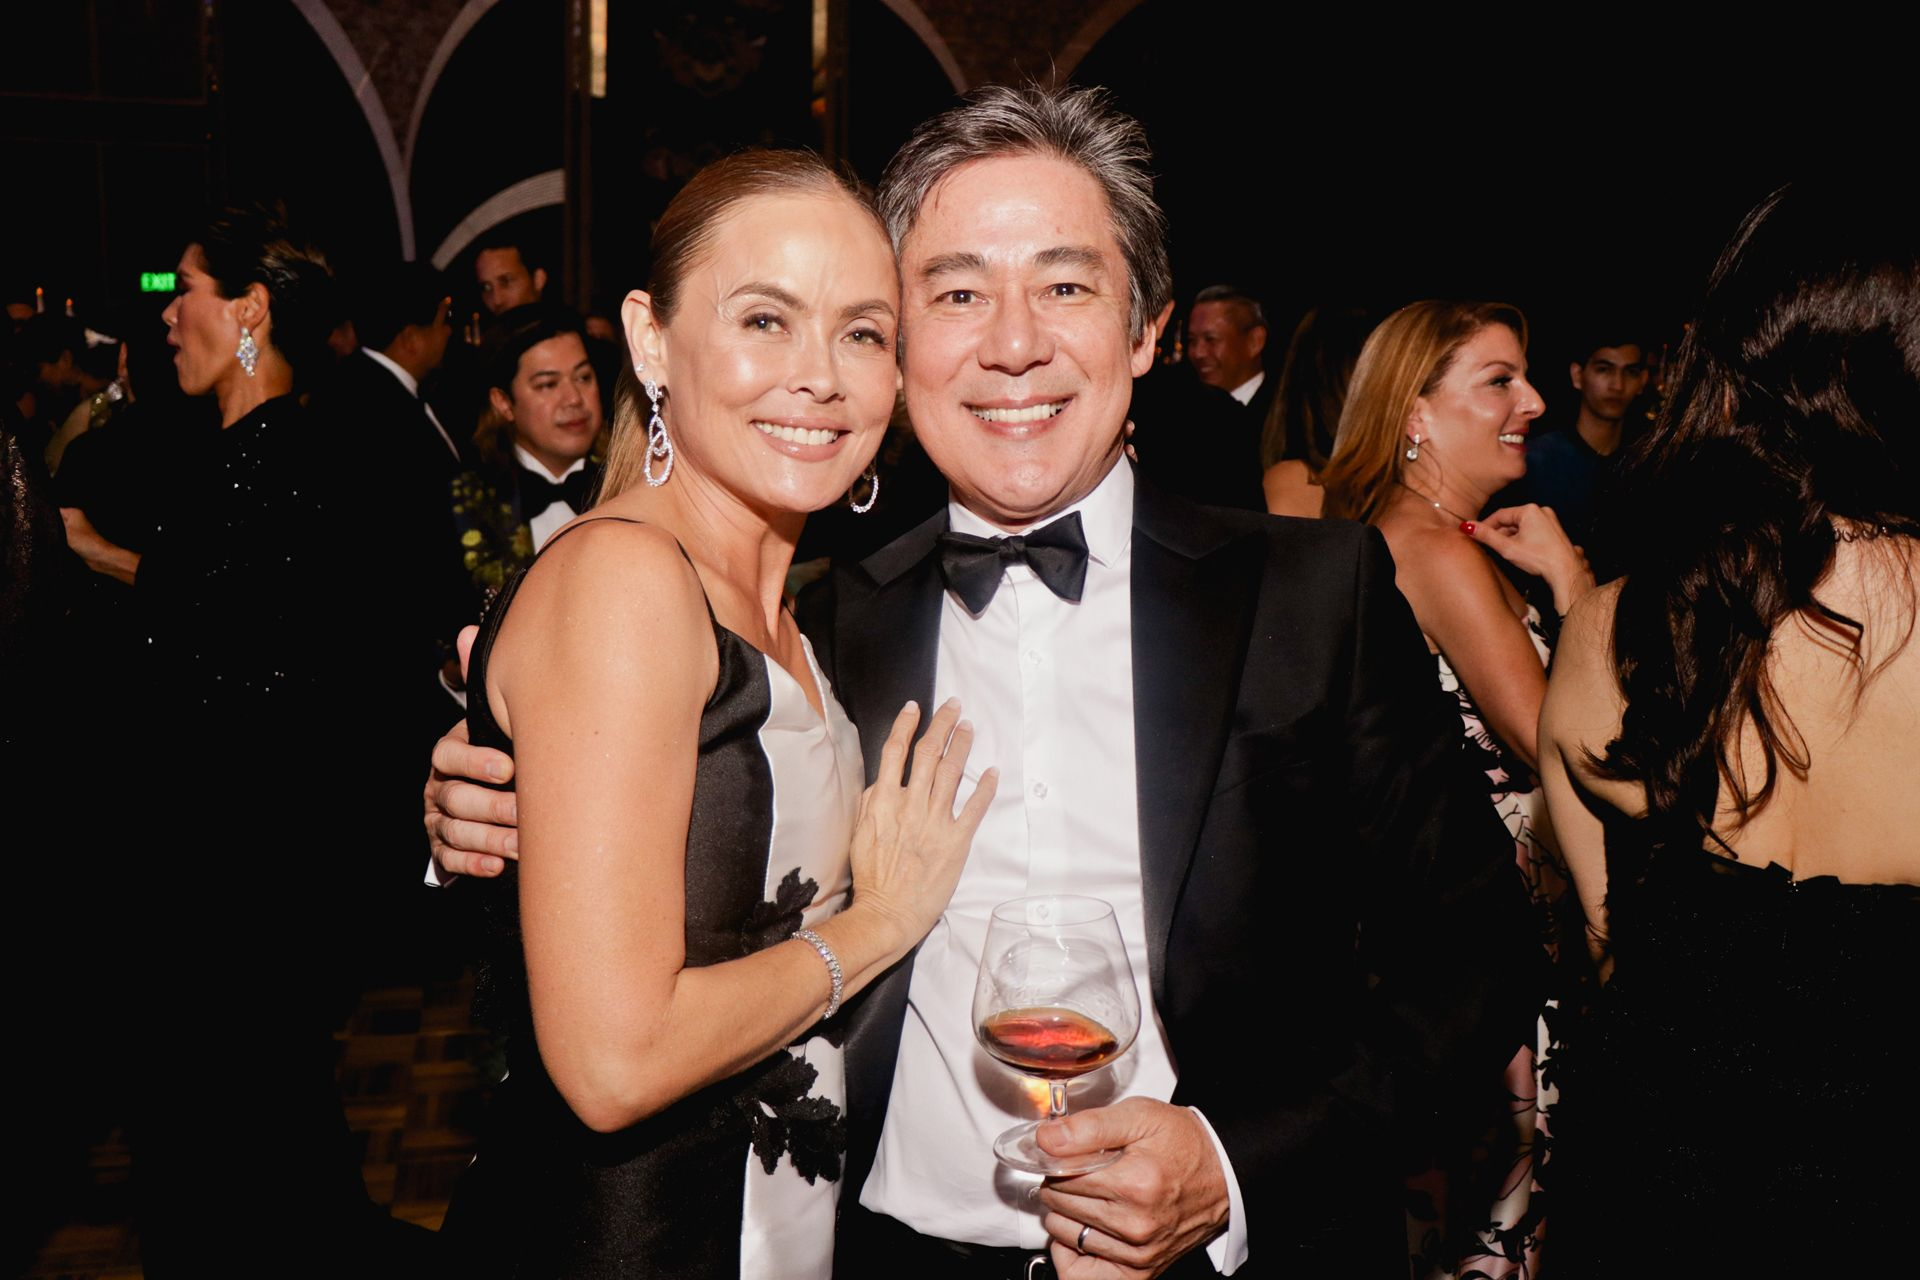 Joanna and Raul Francisco